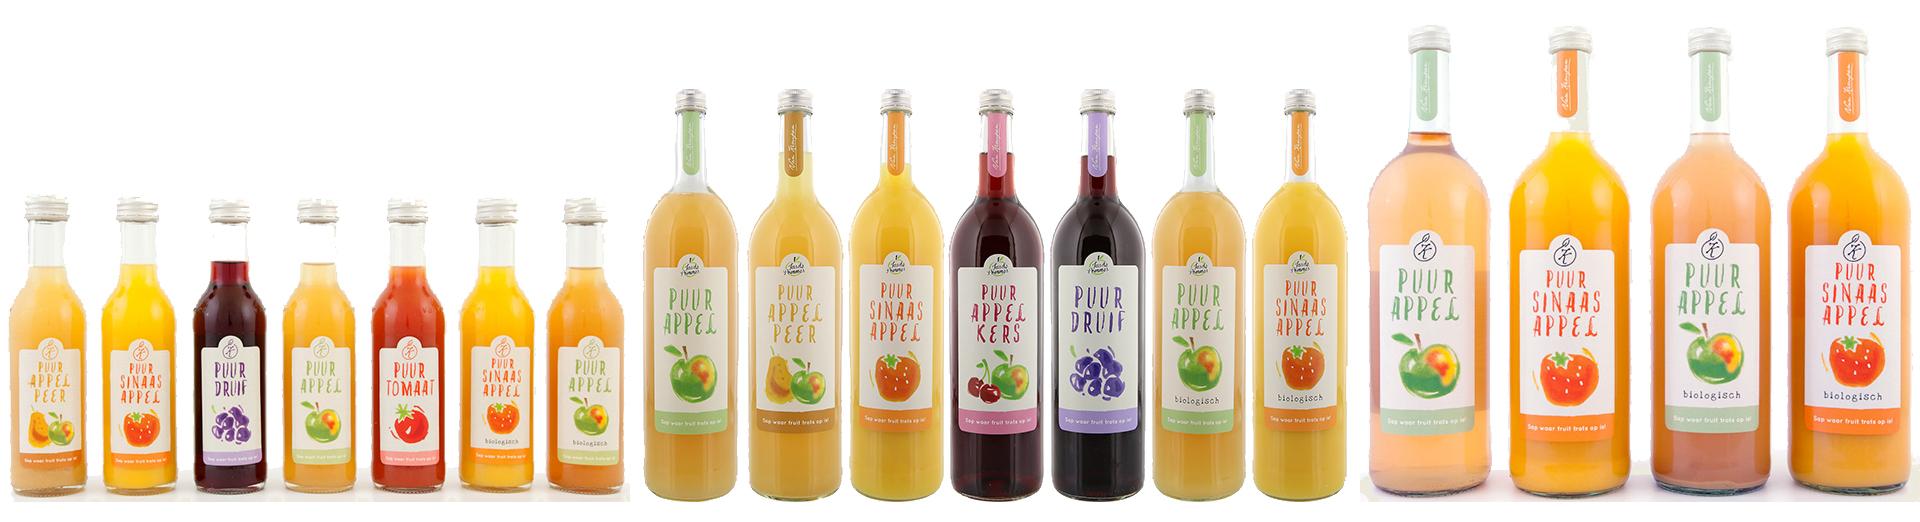 nectar-utrecht-frisdranken-sappen-nederland-biologisch-van-kempen-fruitsappen-foto05